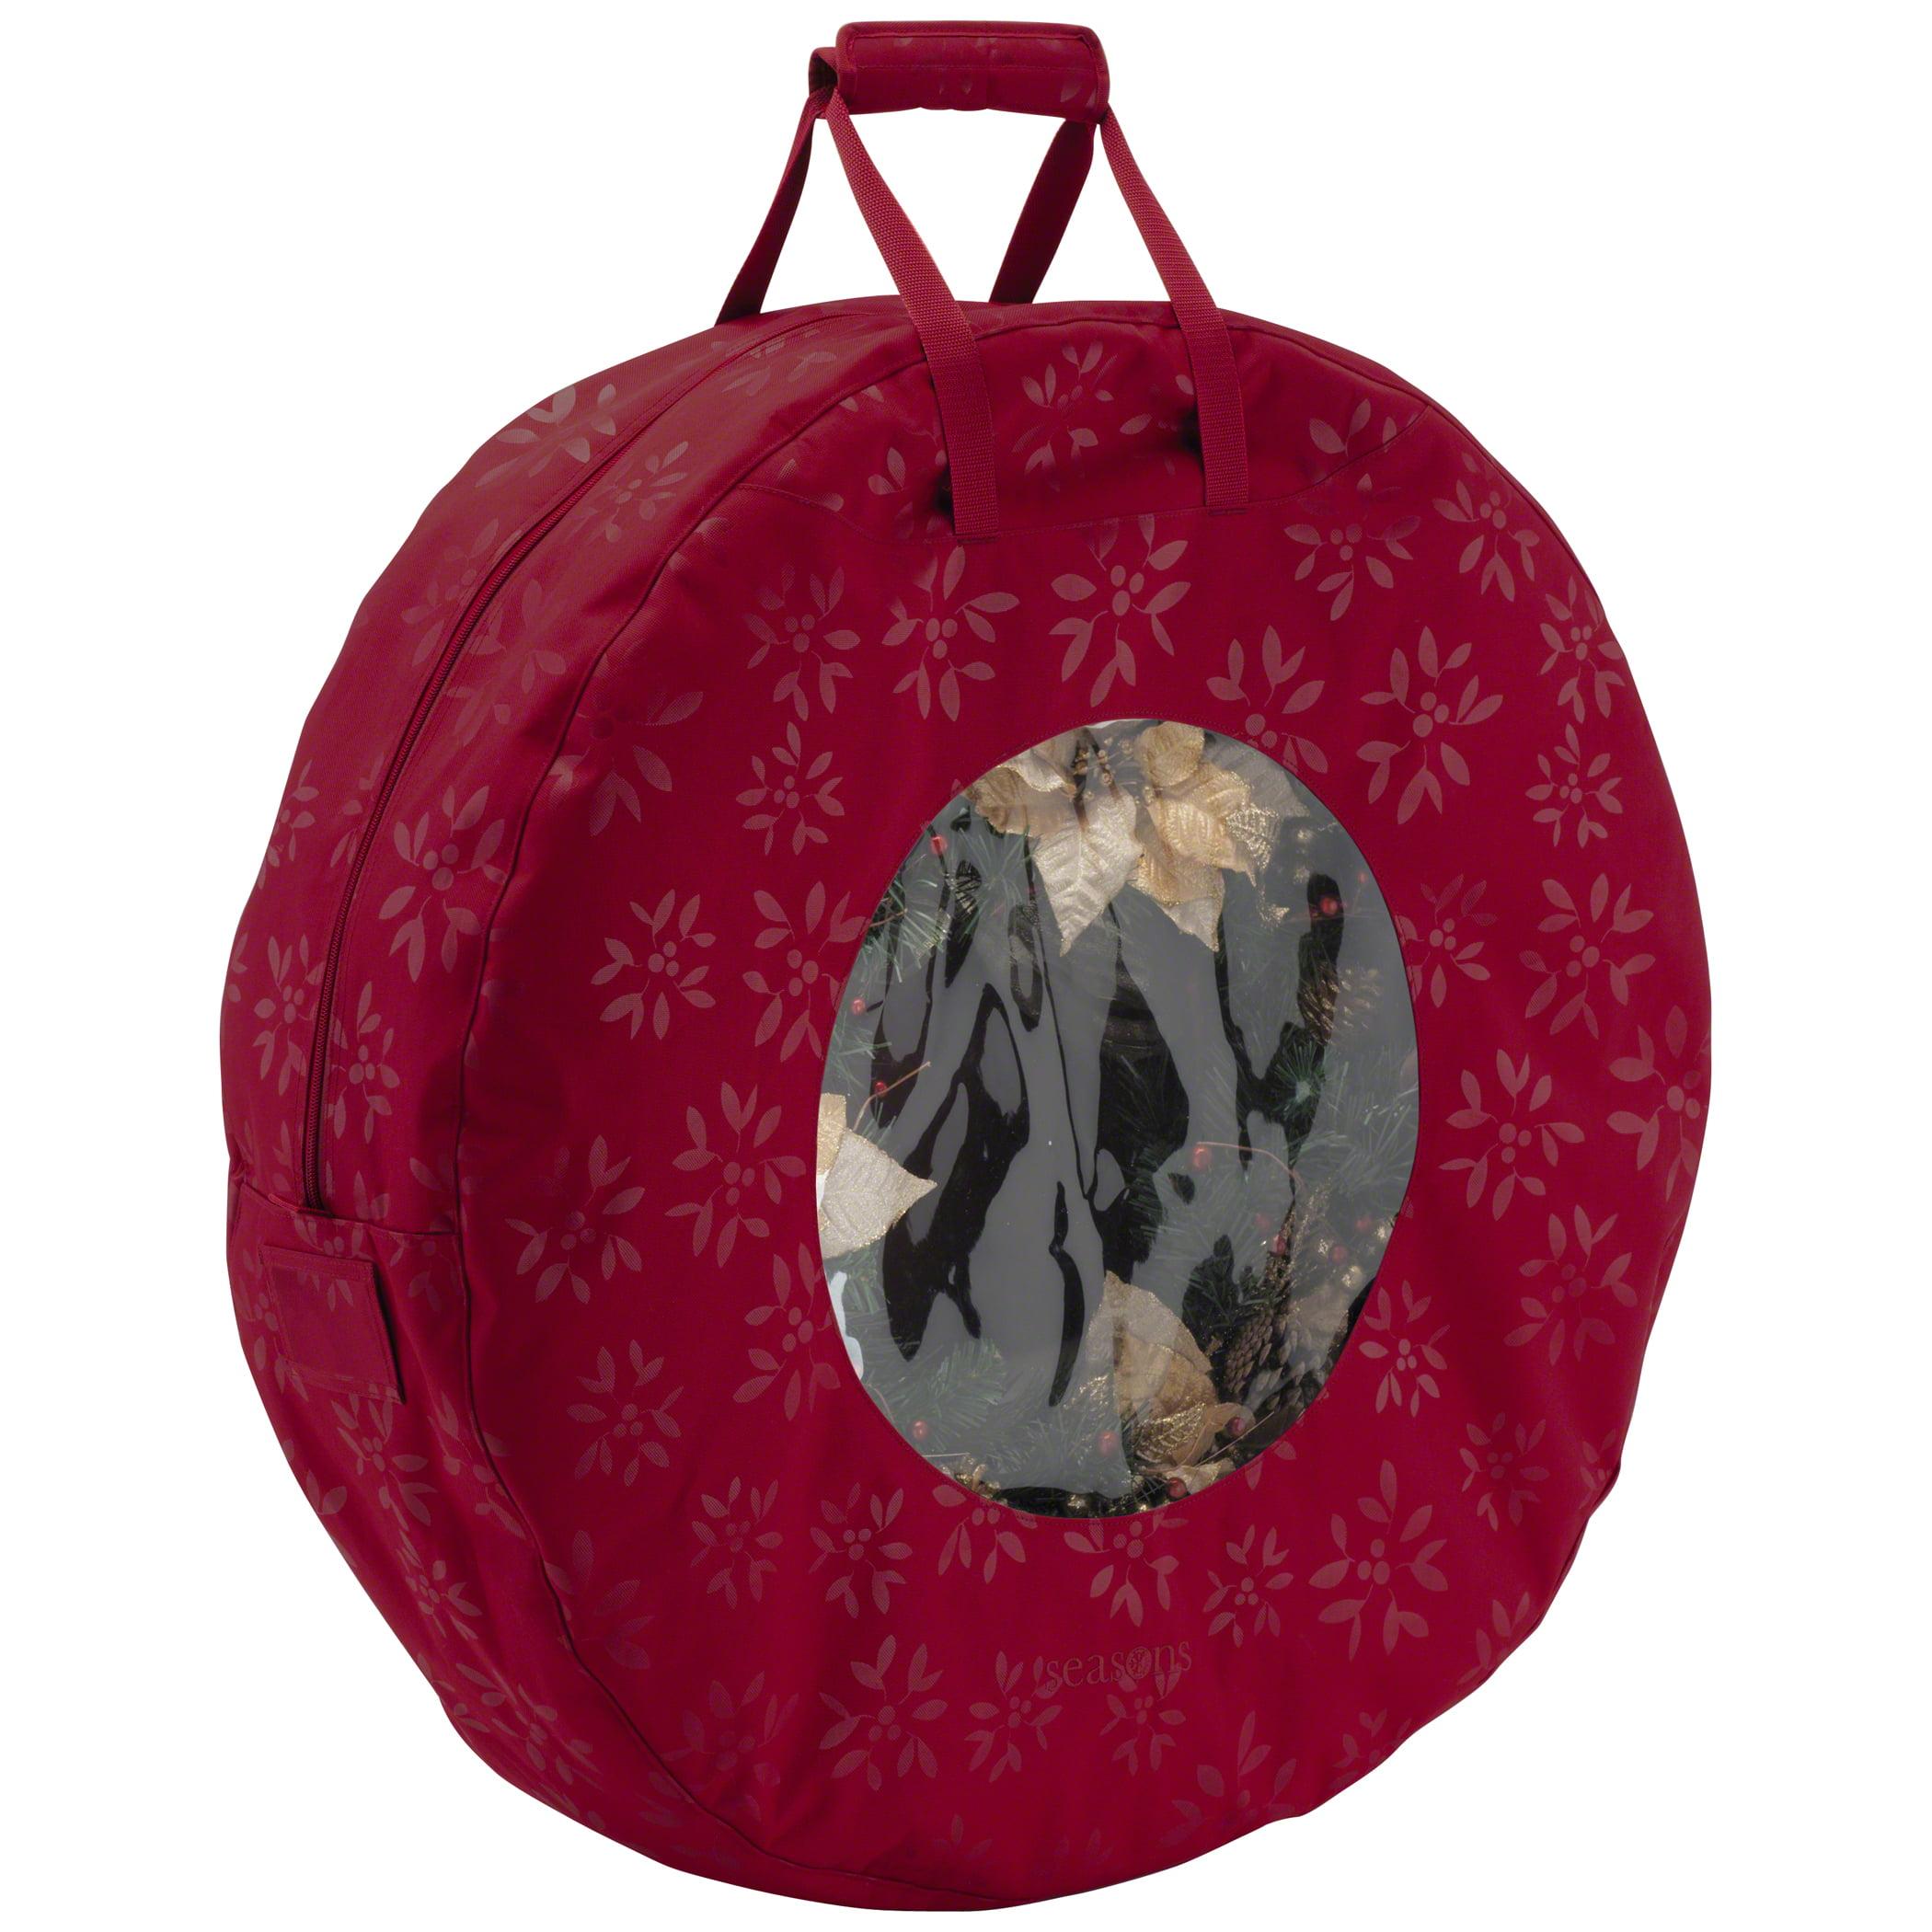 Classic Accessories Seasons Wreath Storage Bag - Heavy-Duty Holiday Storage, Large